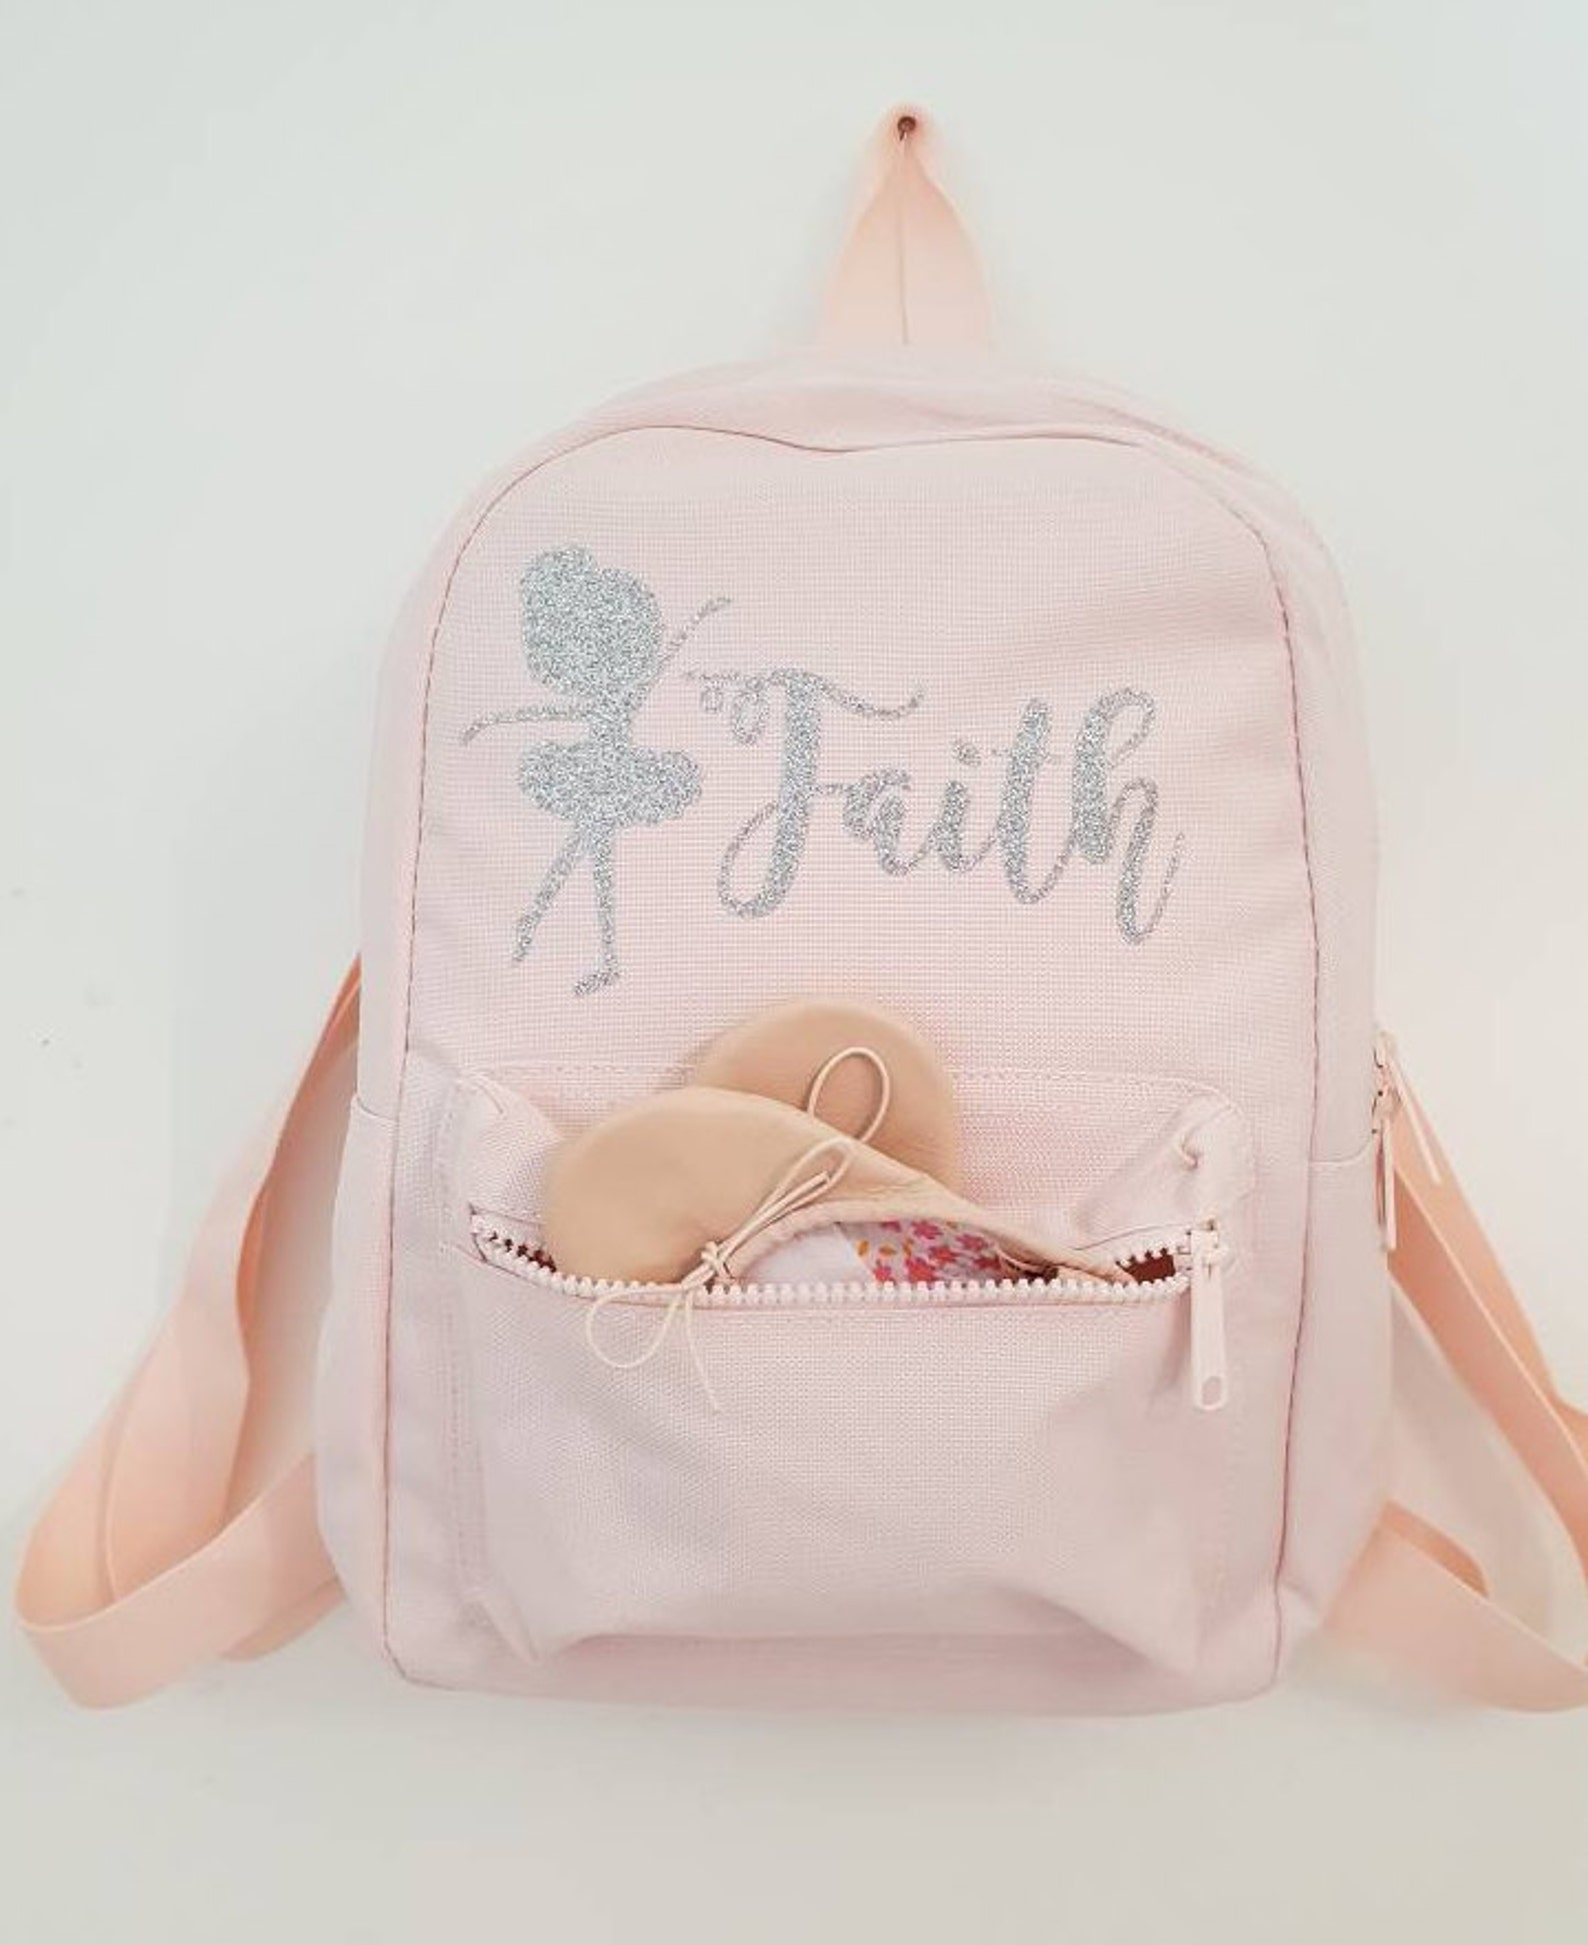 personalised ballet bag girls mini back pack pink dance sack holdall baby light pink ballerina dancer stage costume tap jazz sho